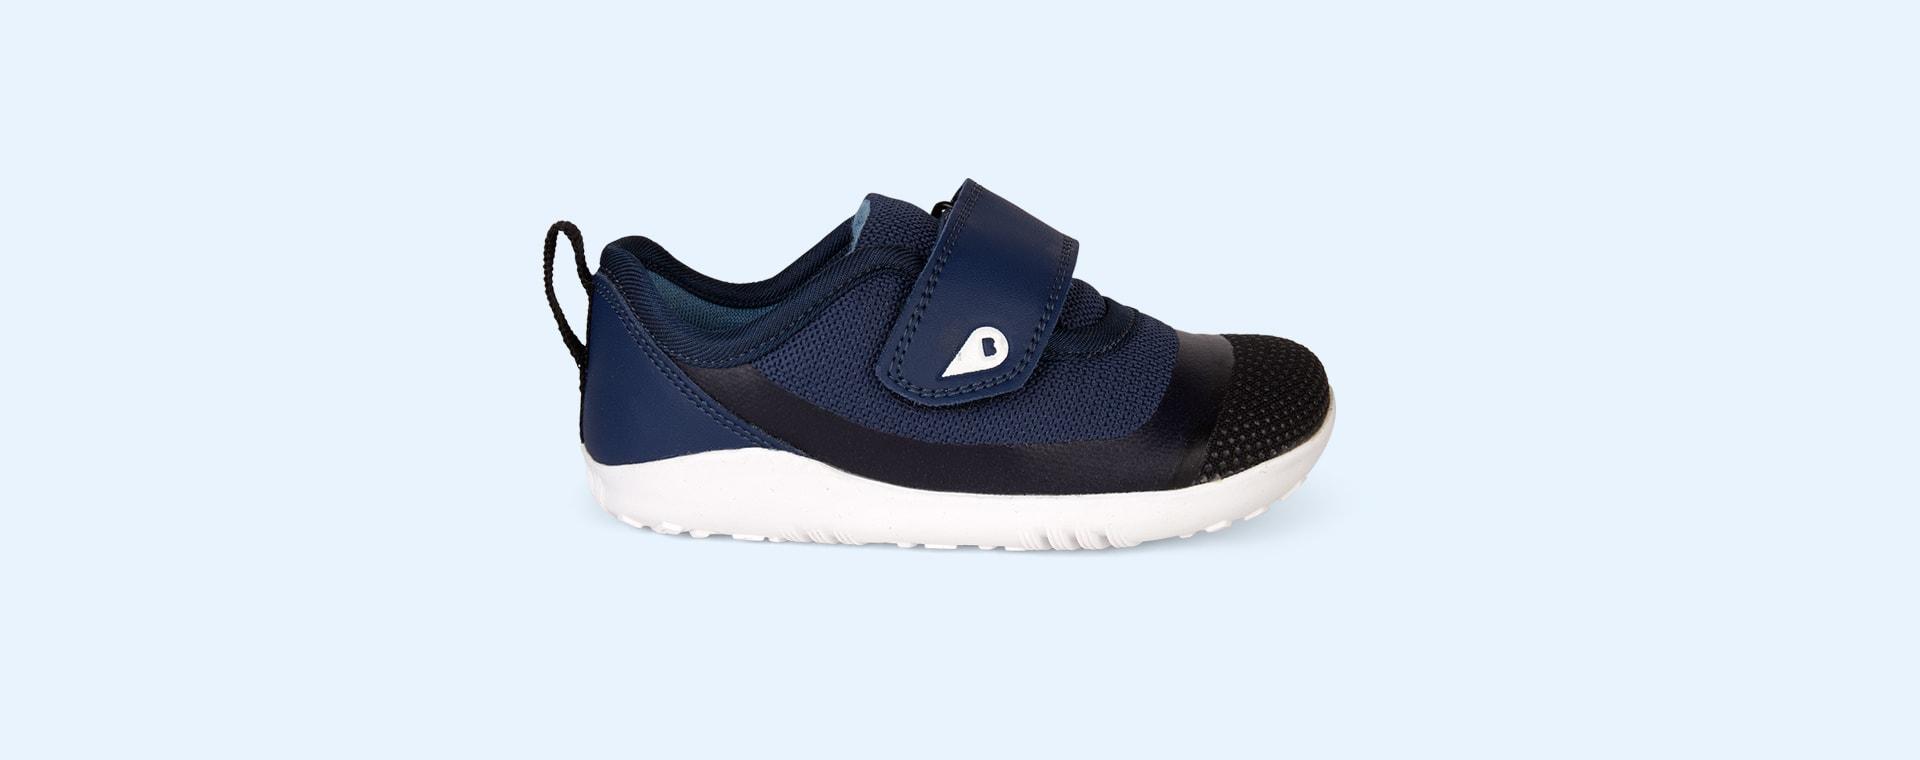 Blue Bobux I-Walk Lo Dimension Shoe